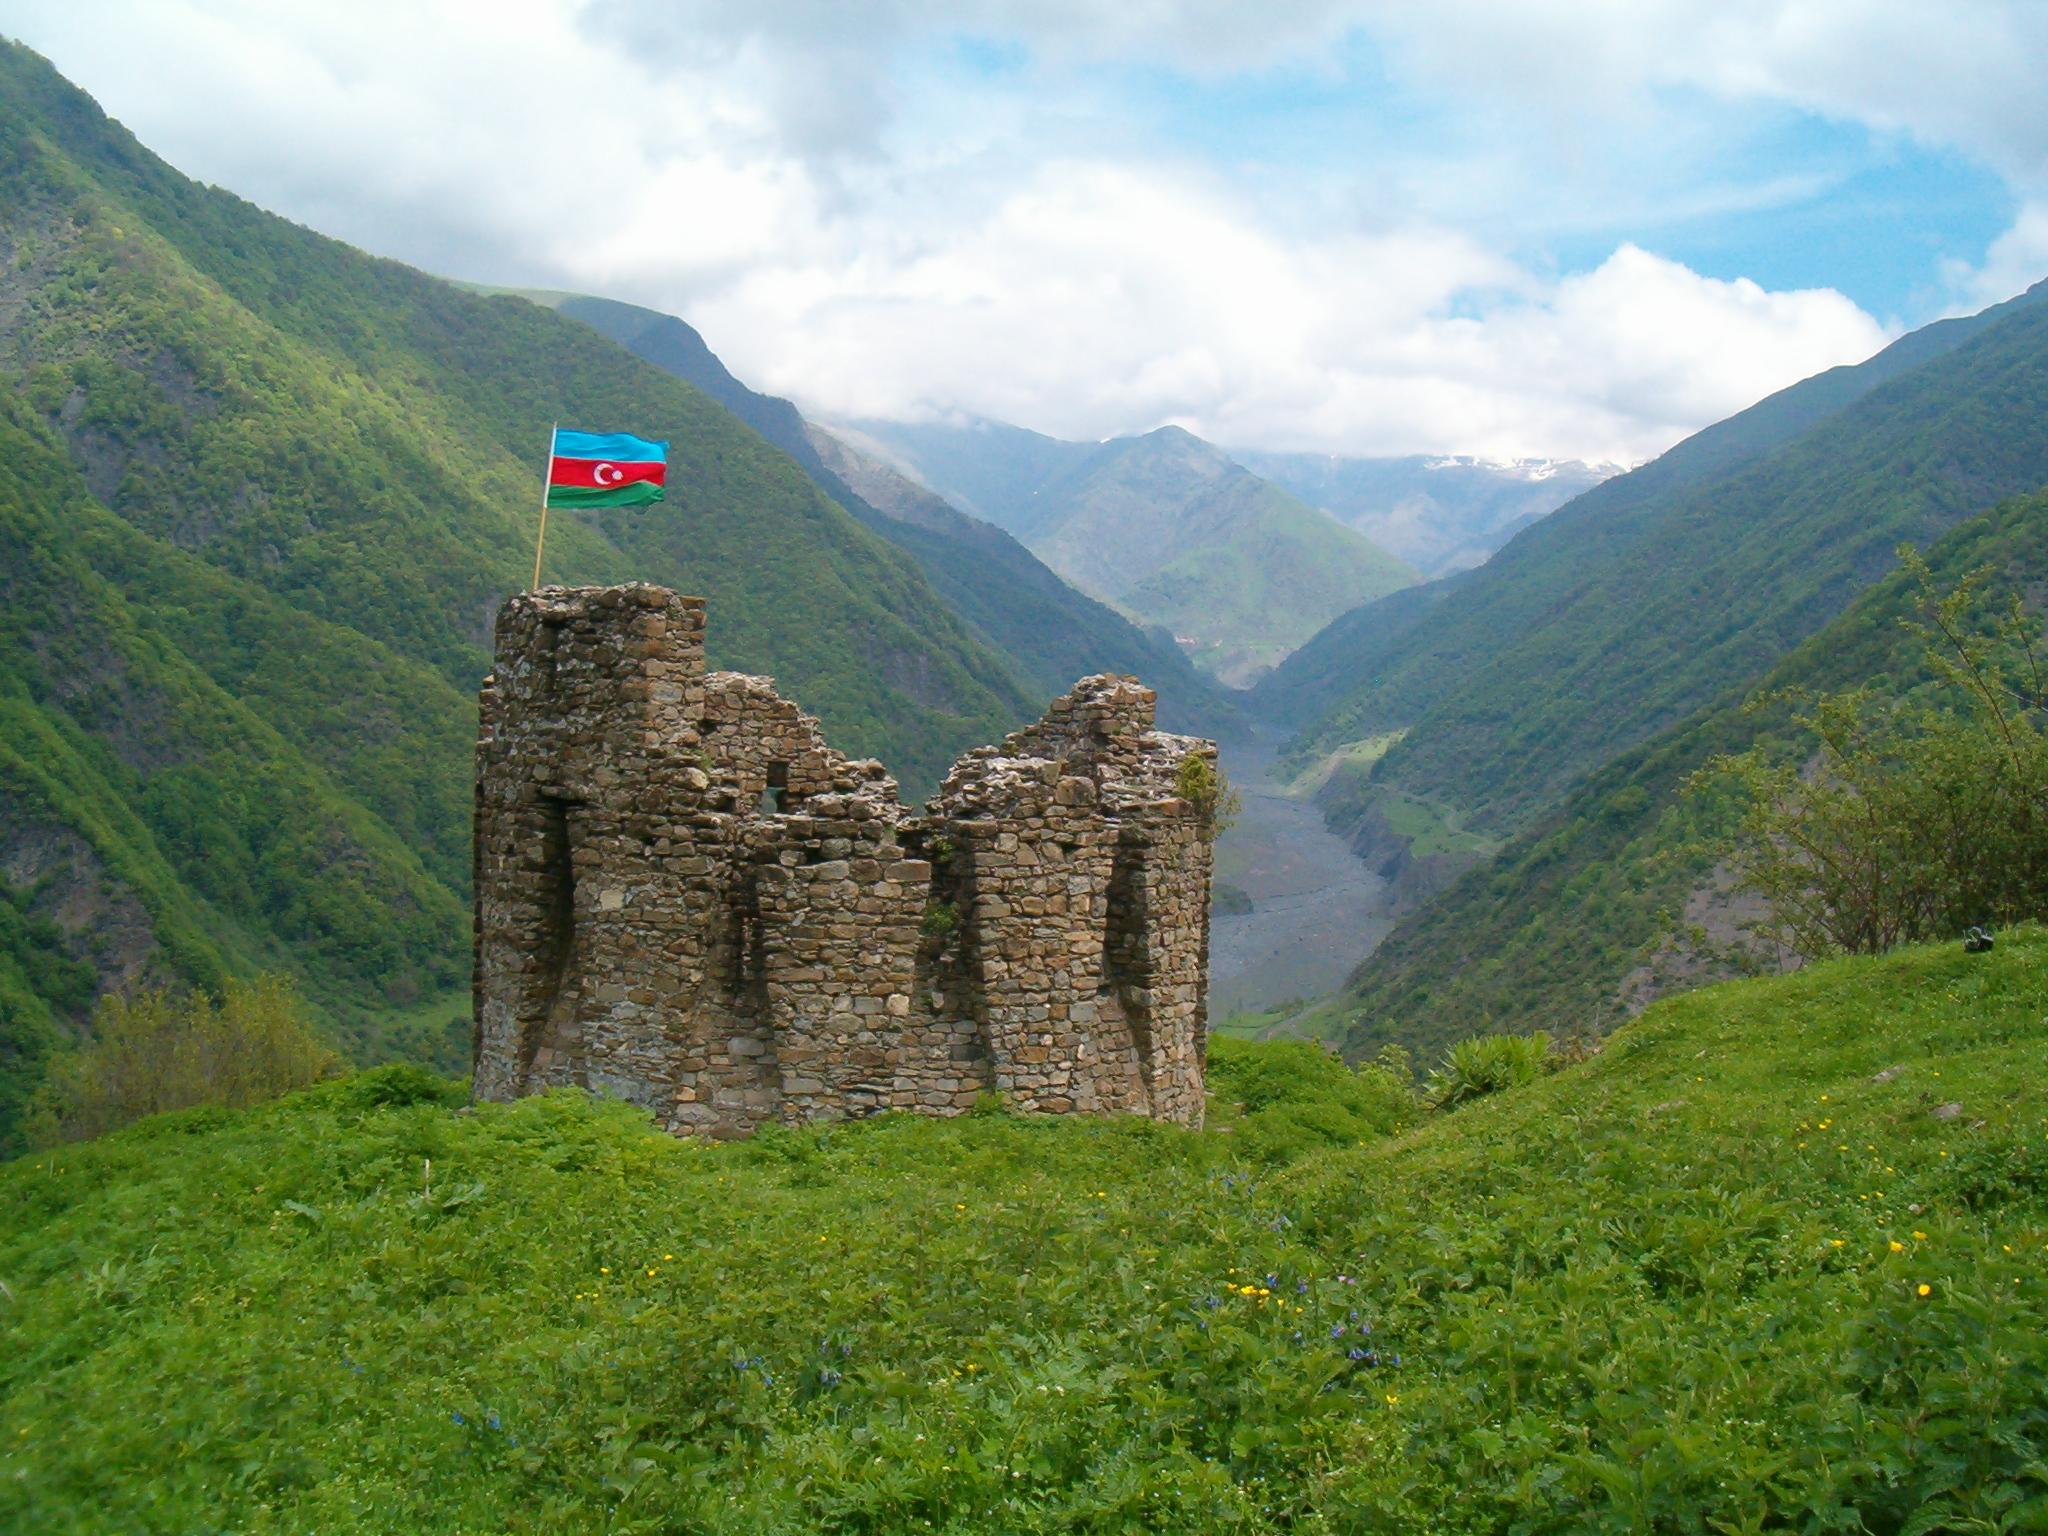 Азербайджан природа фотографии 2